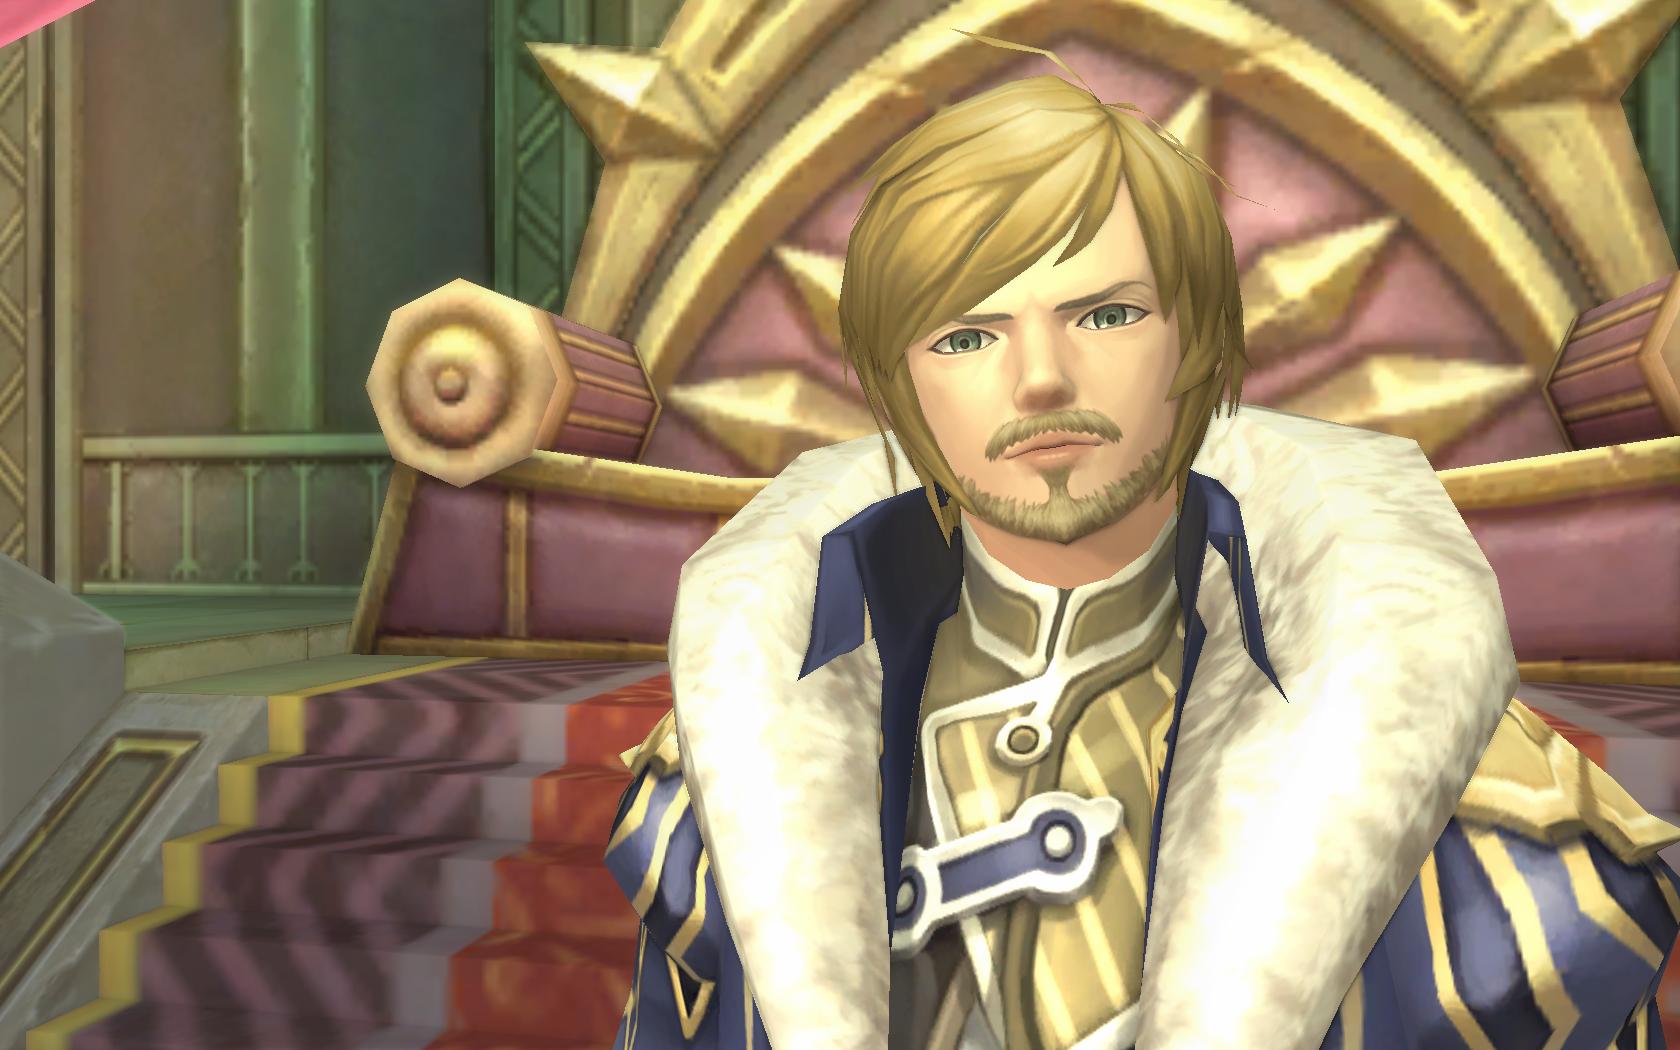 King Reinhard